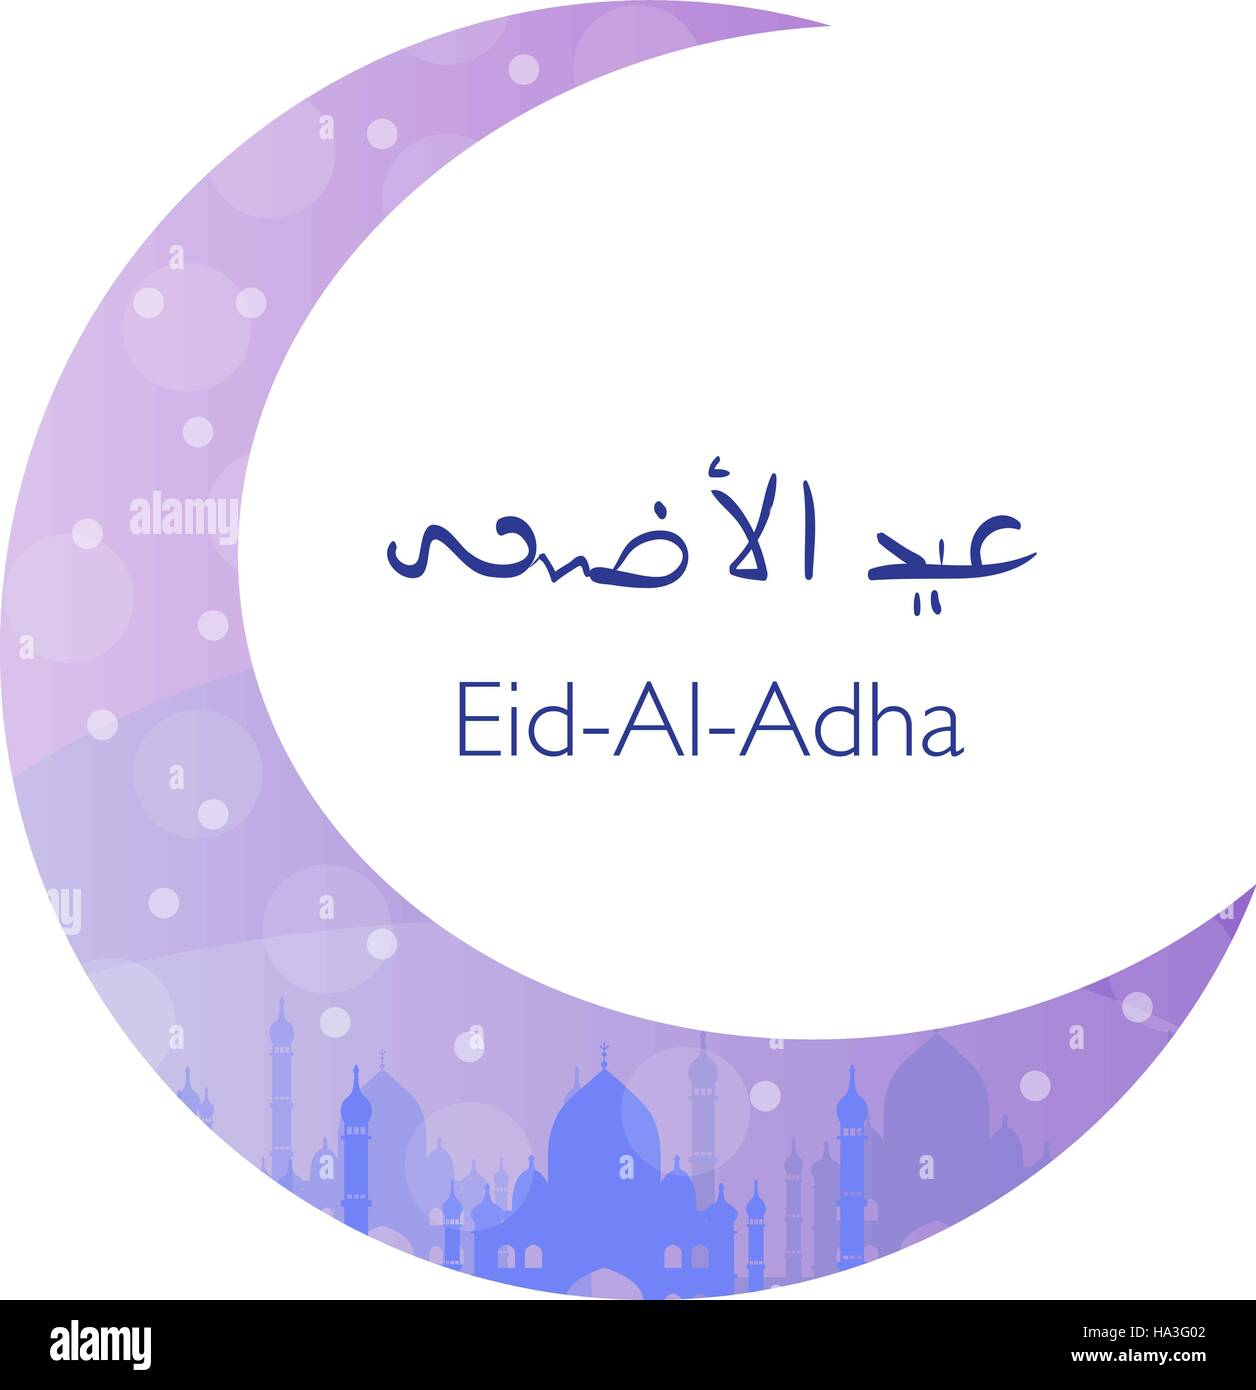 Eid Ul Adha Mubarak Stock Photos Eid Ul Adha Mubarak Stock Images